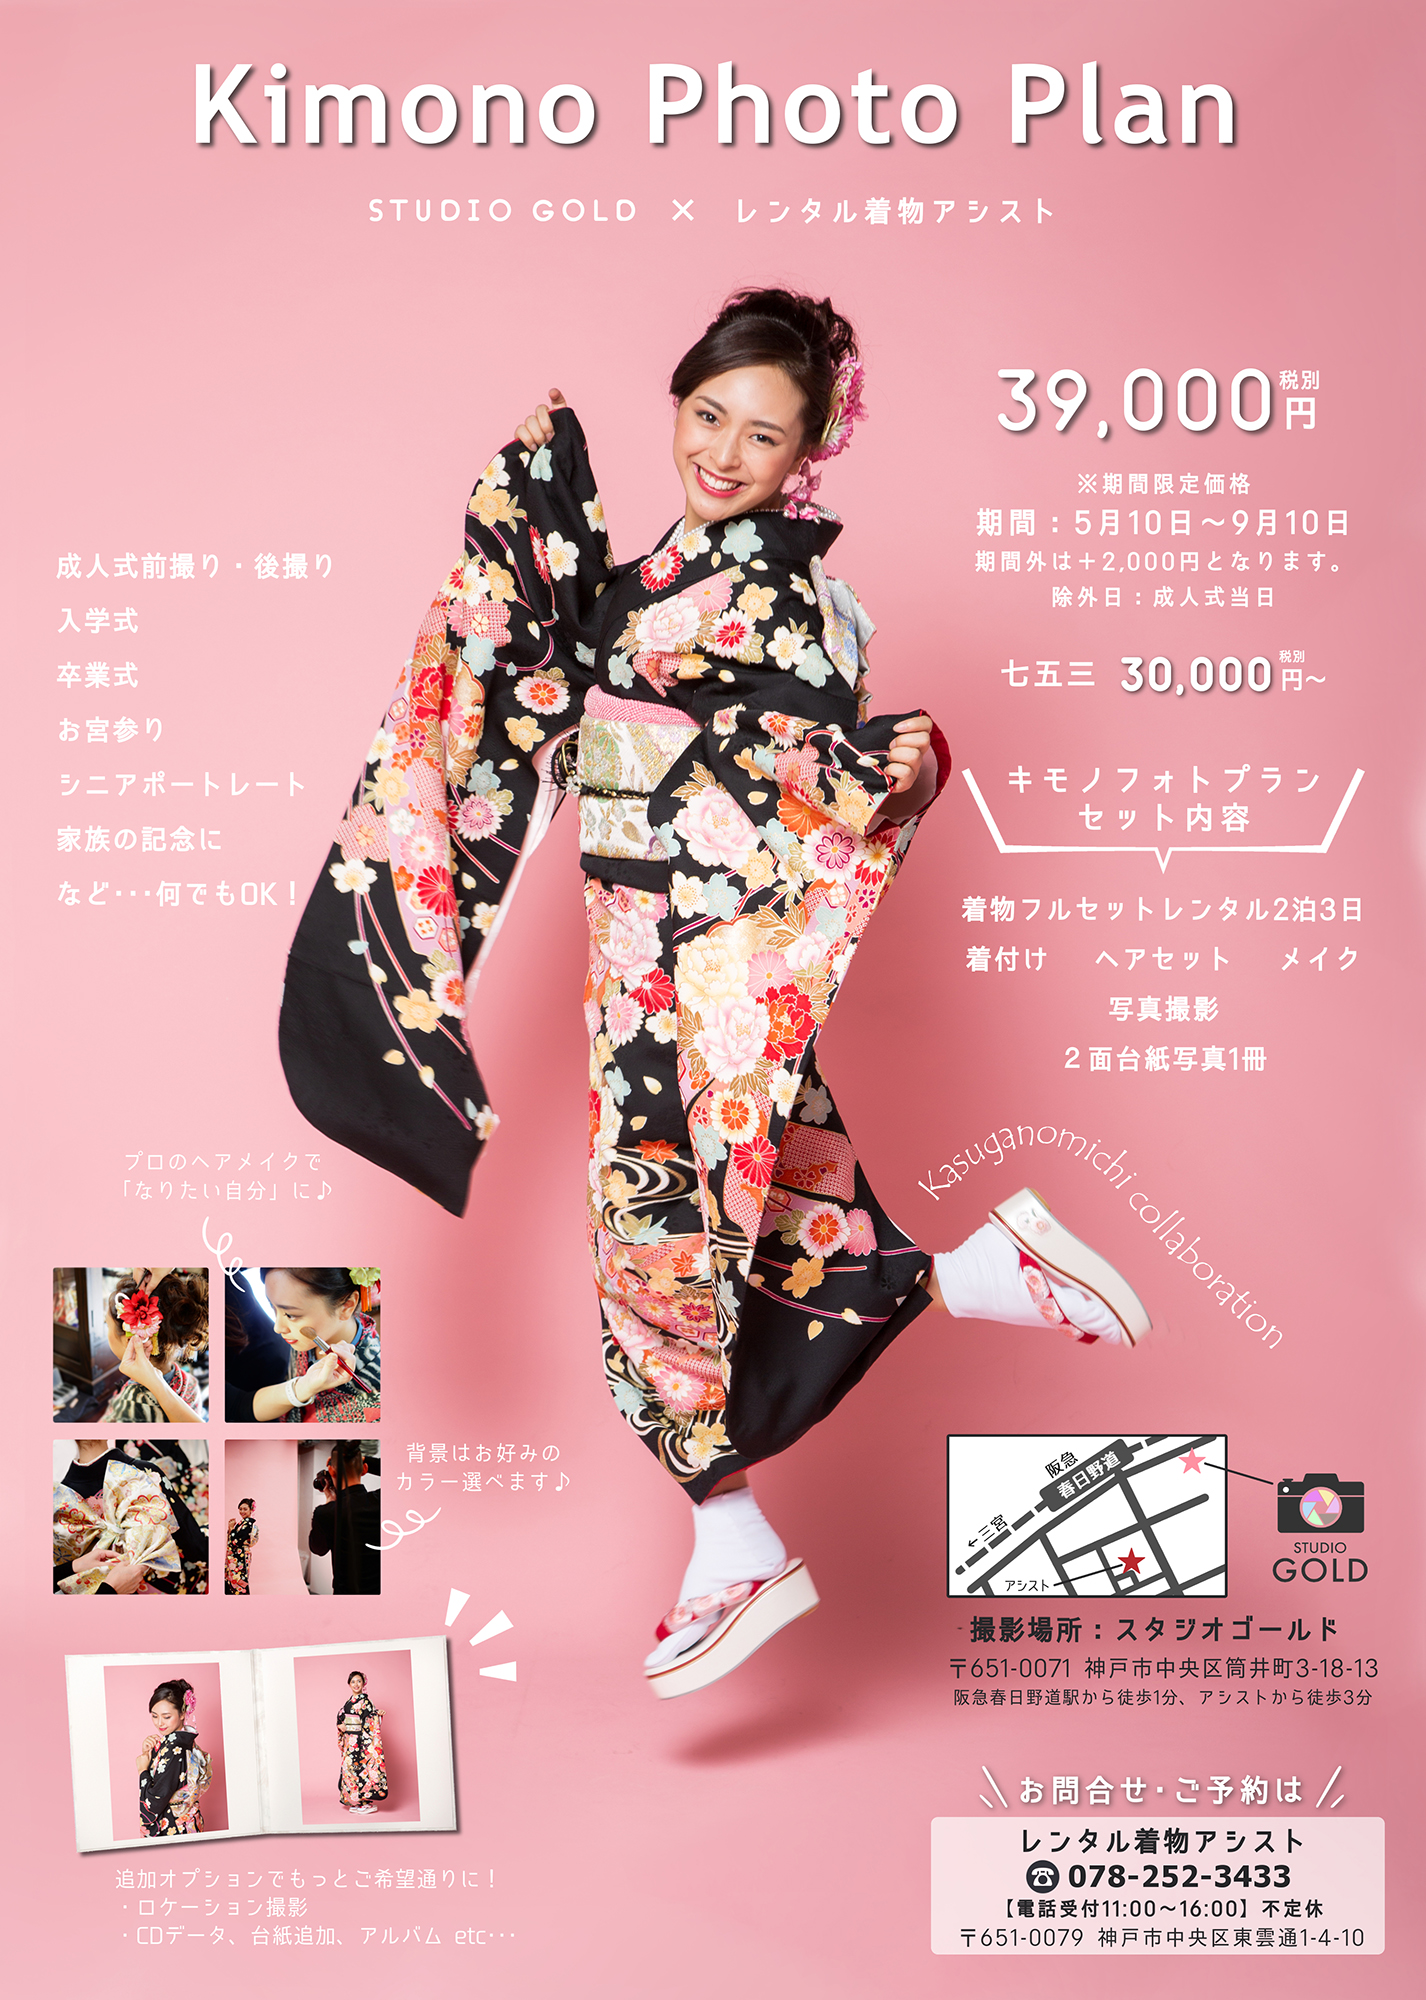 神戸,成人式,前撮り,振袖,記念写真,相楽園,出張撮影,金本義隆,内絵里,カメラマンツツジ,神戸